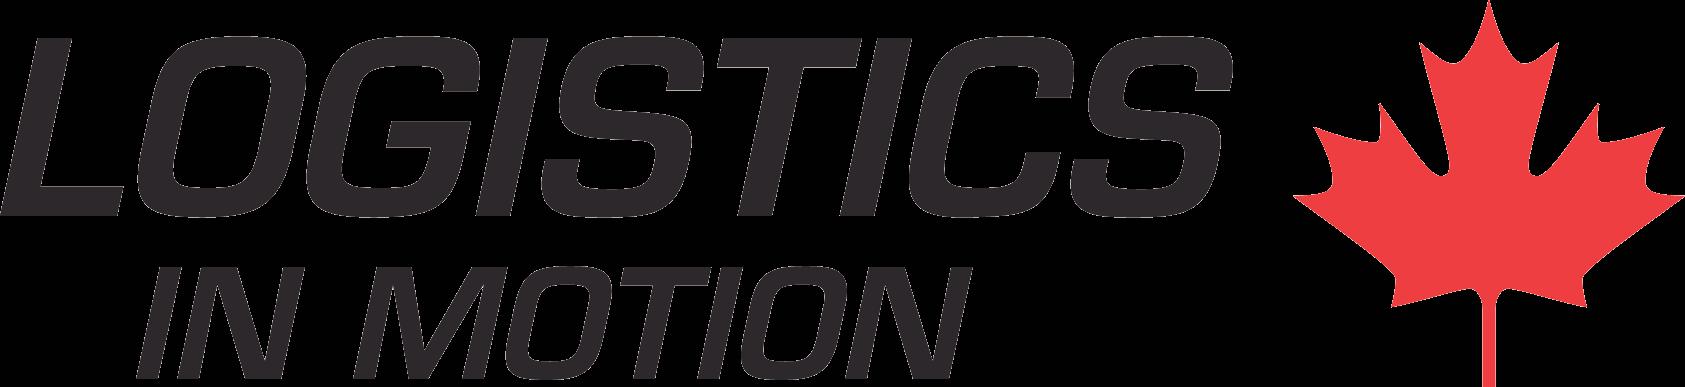 Clerical Associate - Logistics in Motion - Job Board